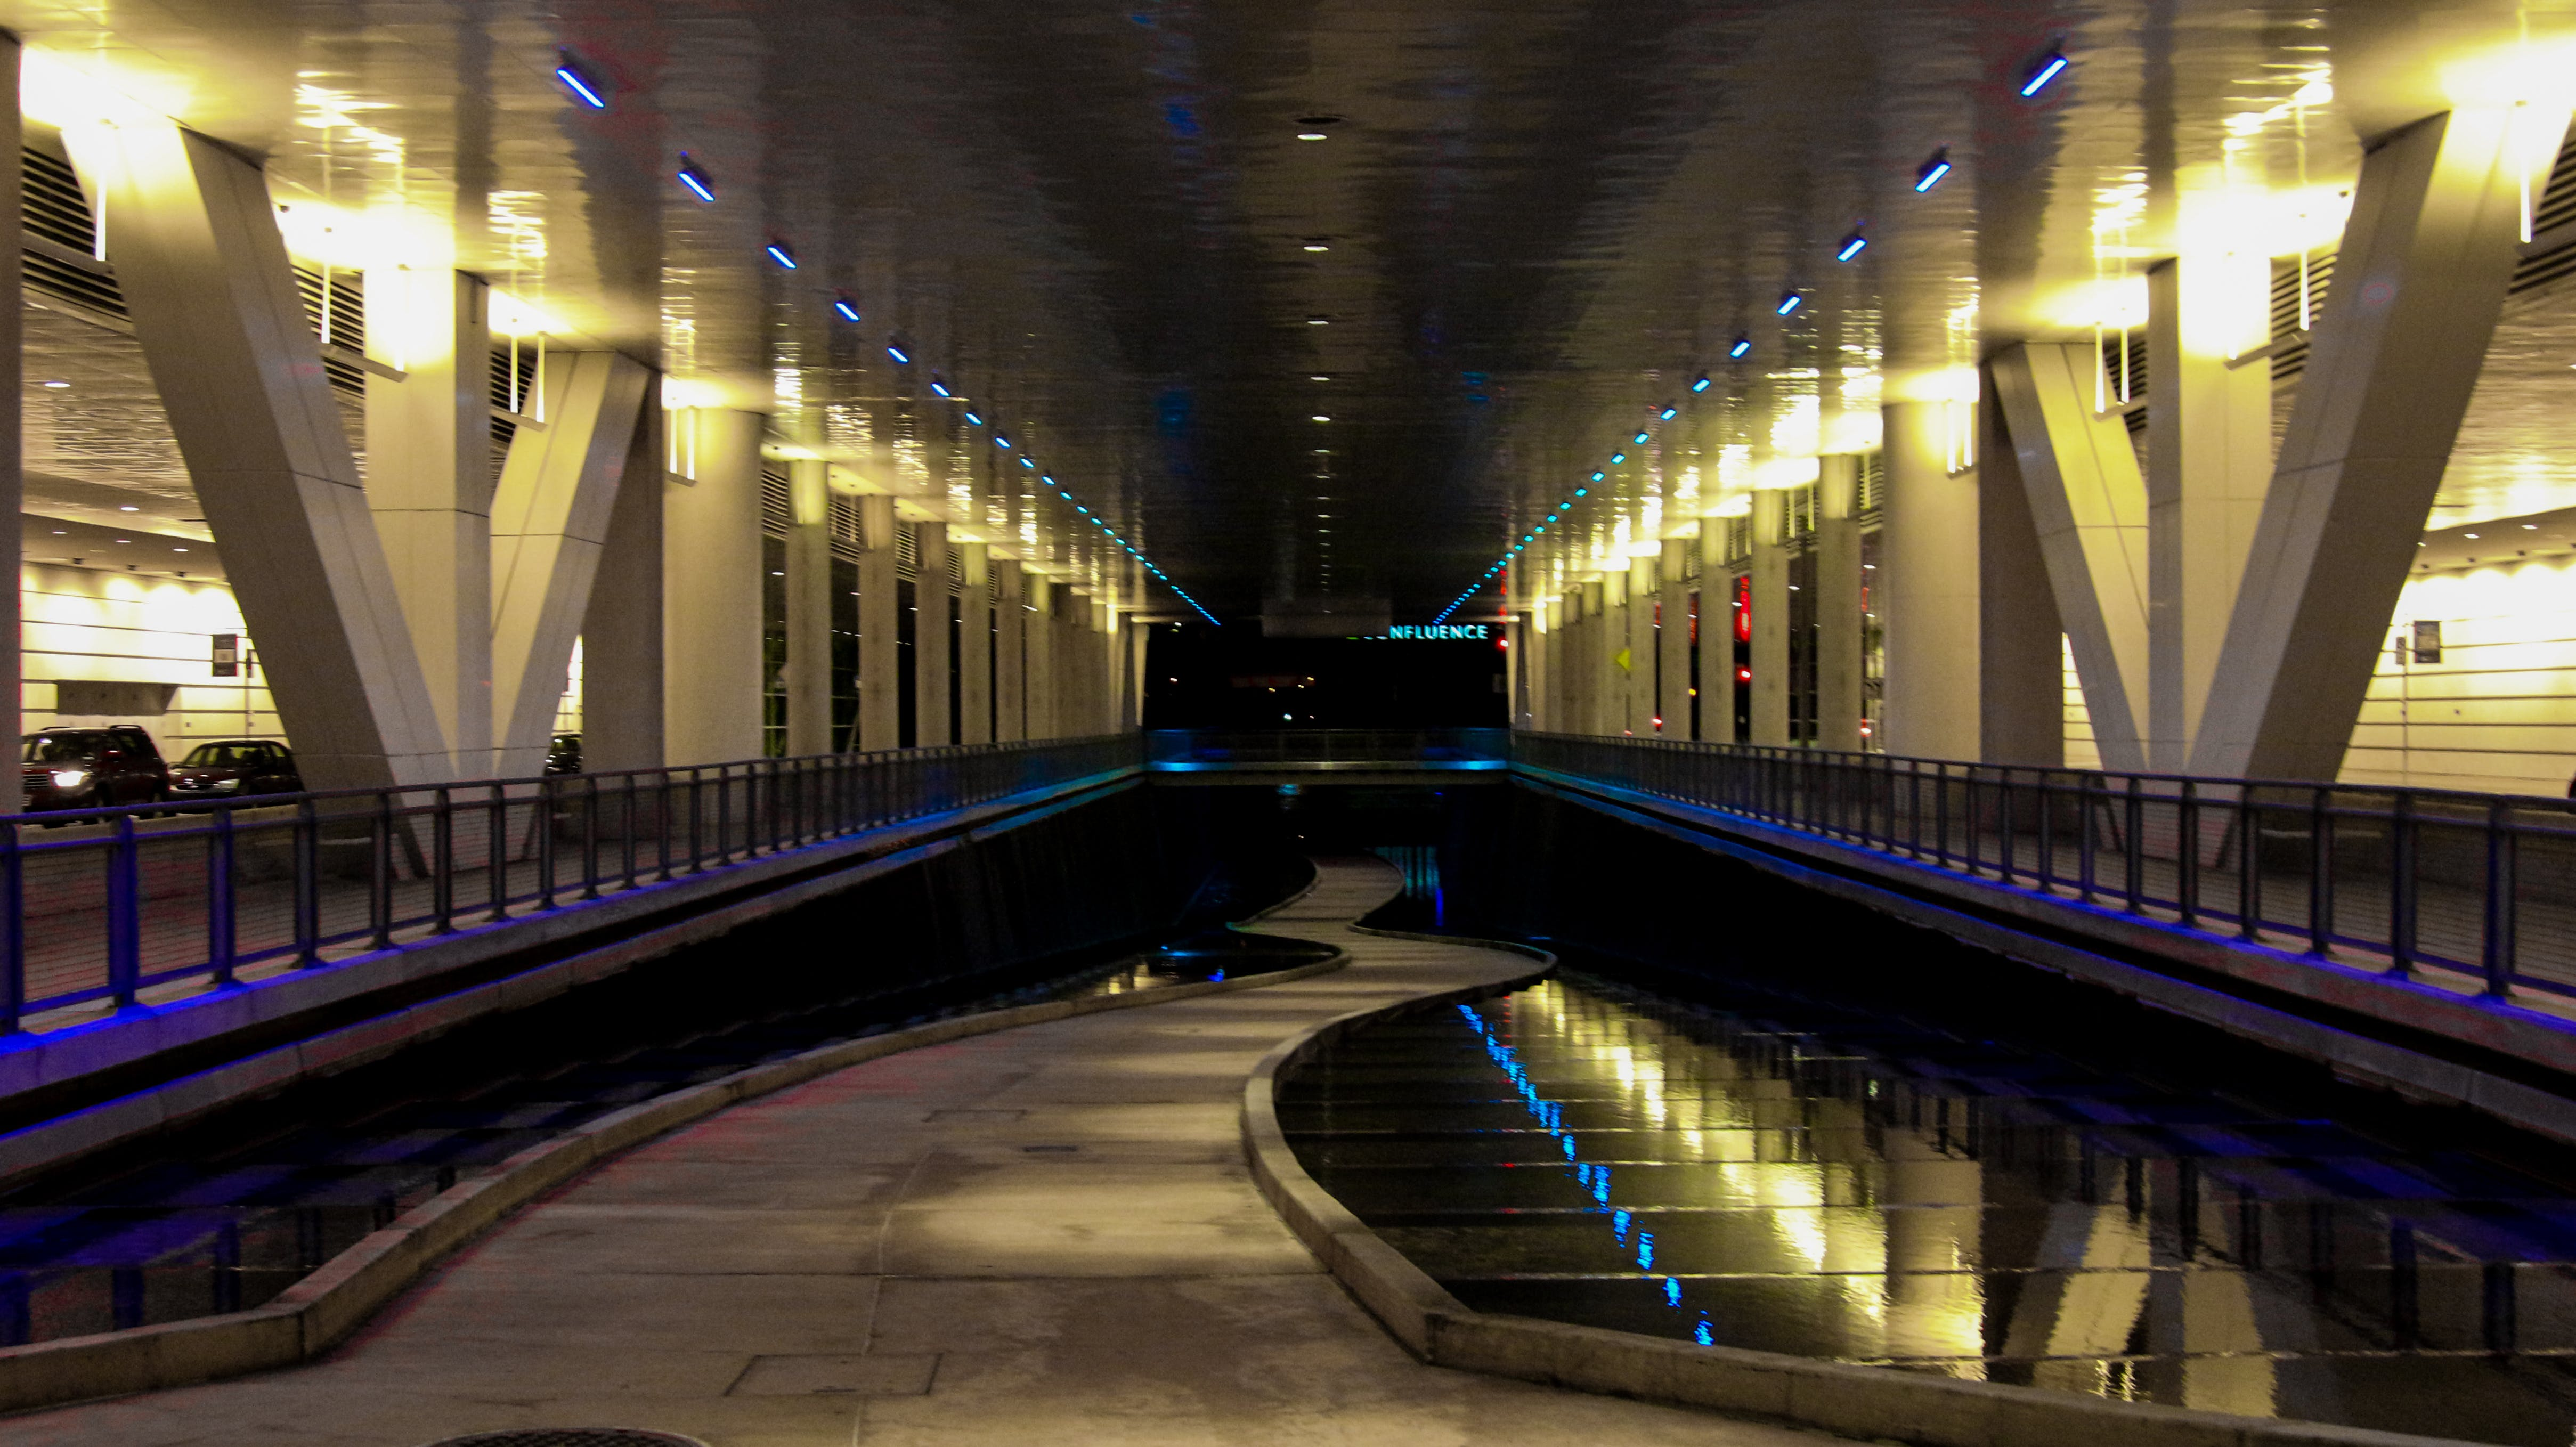 Free stock photo of city, lights, night, dark